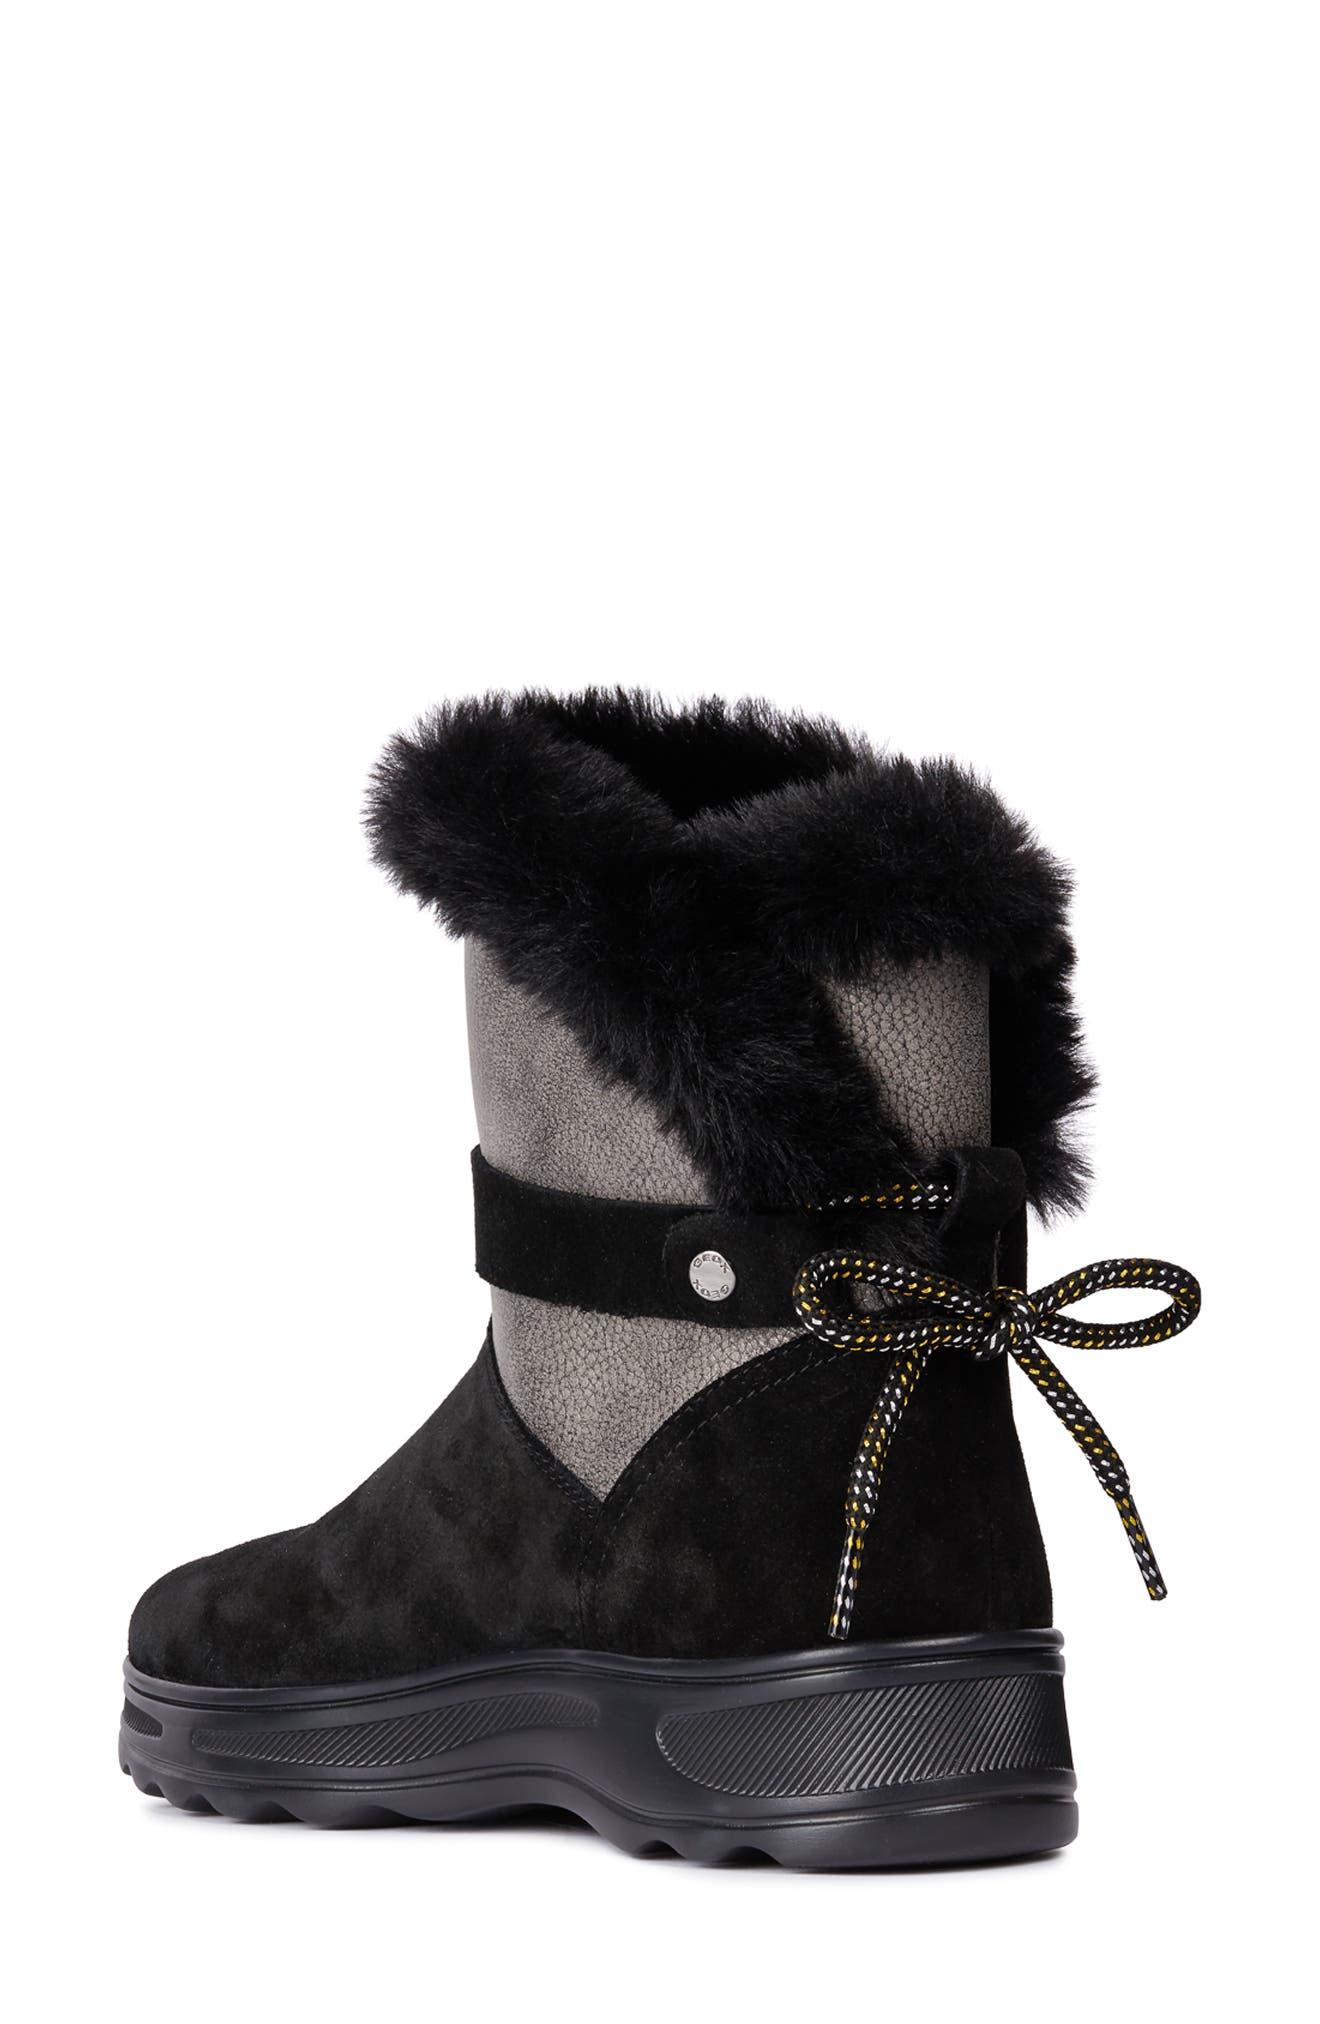 Hosmos ABX Waterproof Faux Fur Trim Boot,                             Alternate thumbnail 2, color,                             BLACK/ DARK GREY SUEDE